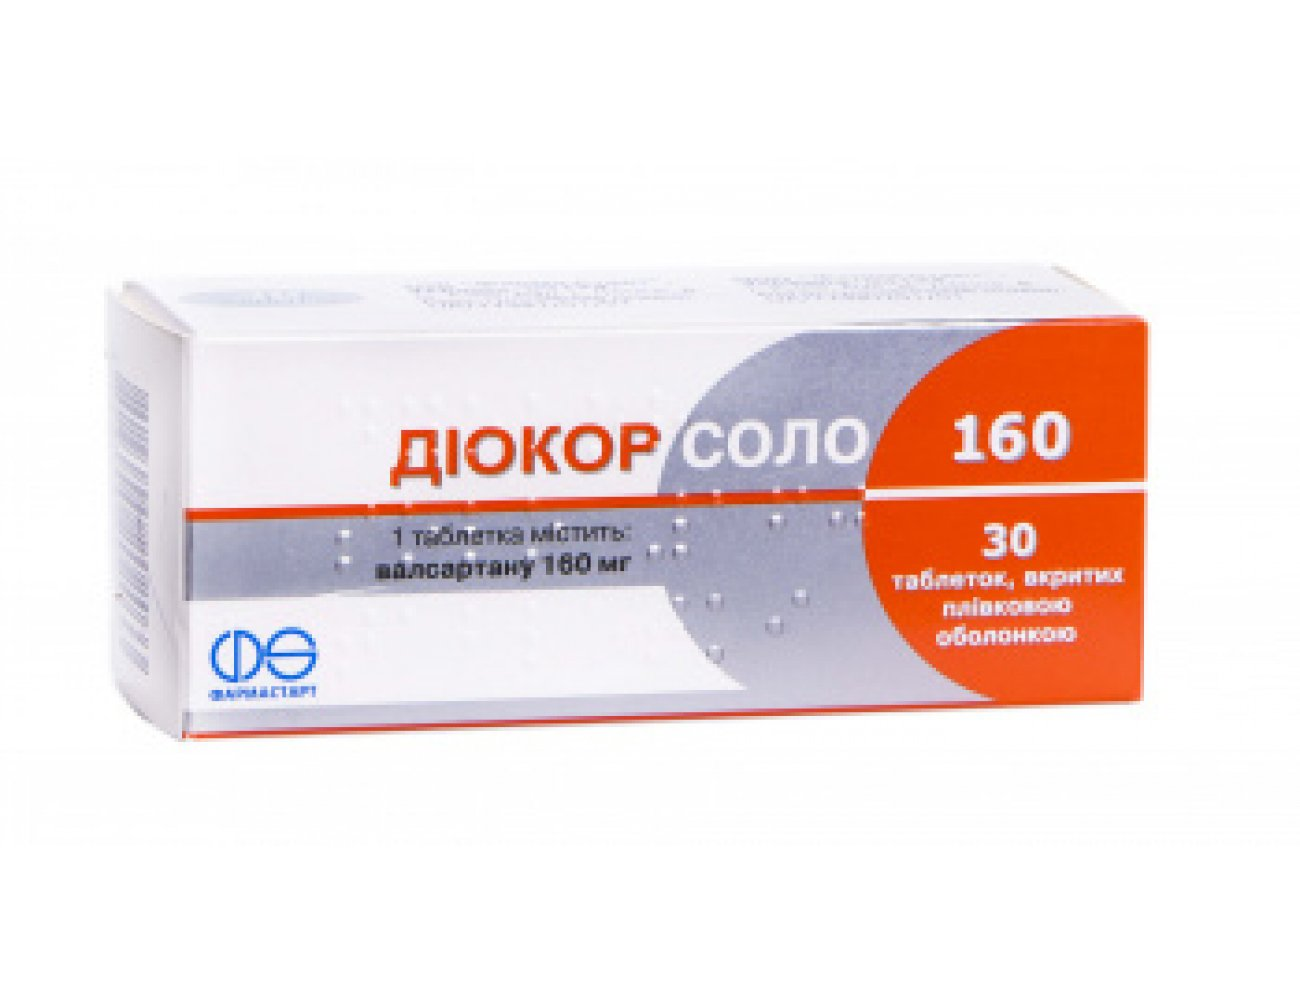 Diocor Solo 160 (valsartan, hydrochlorothiazide) coated tablets 160 mg. №30